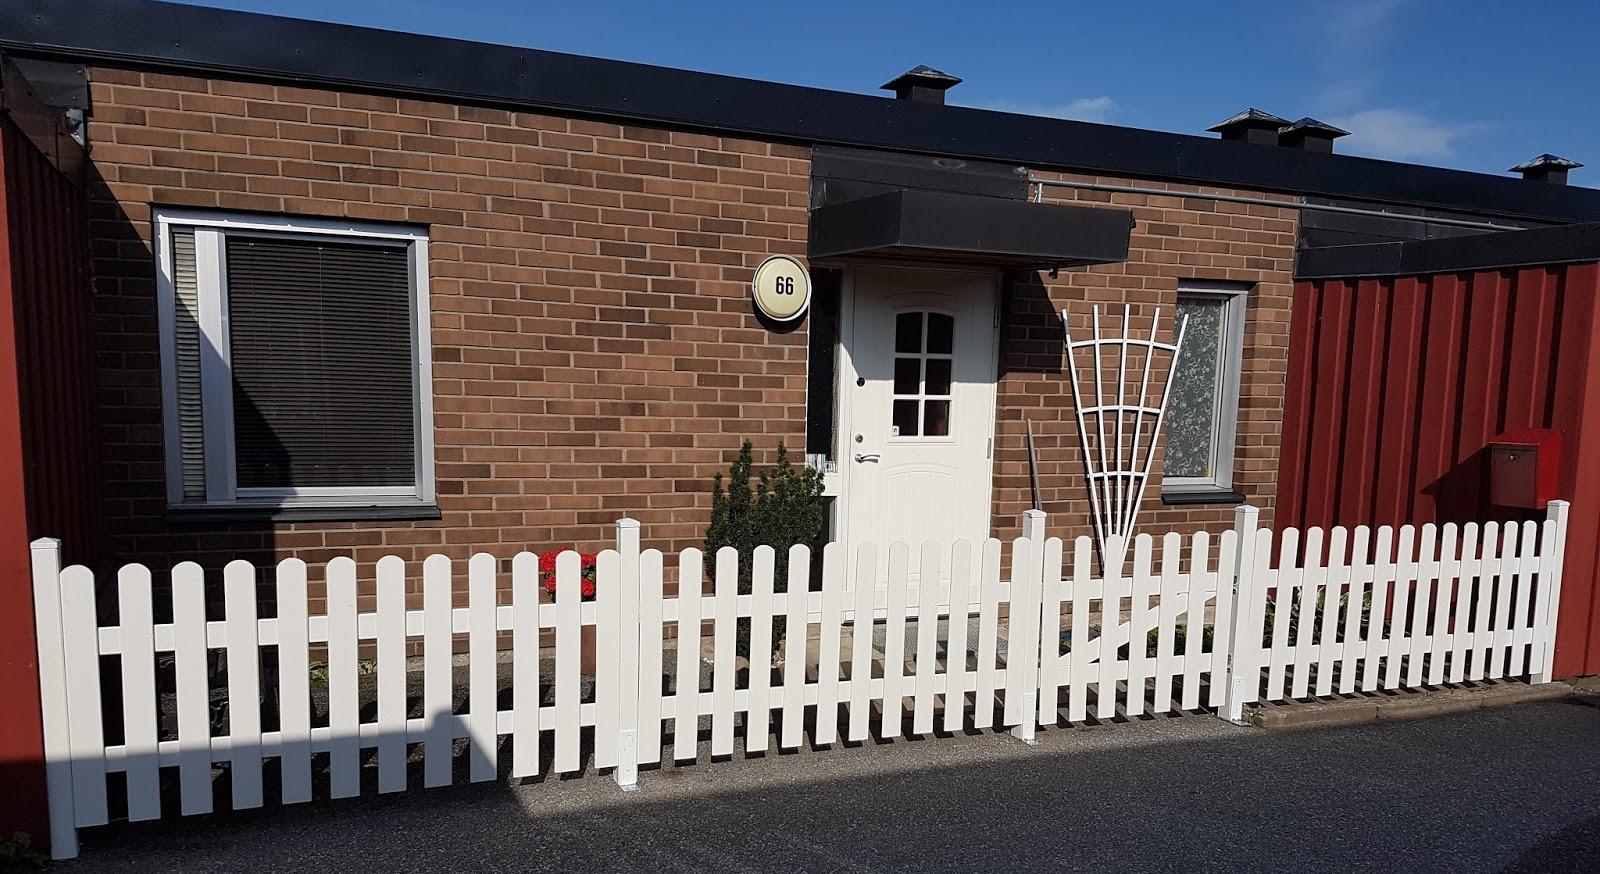 bauhaus malmö staket